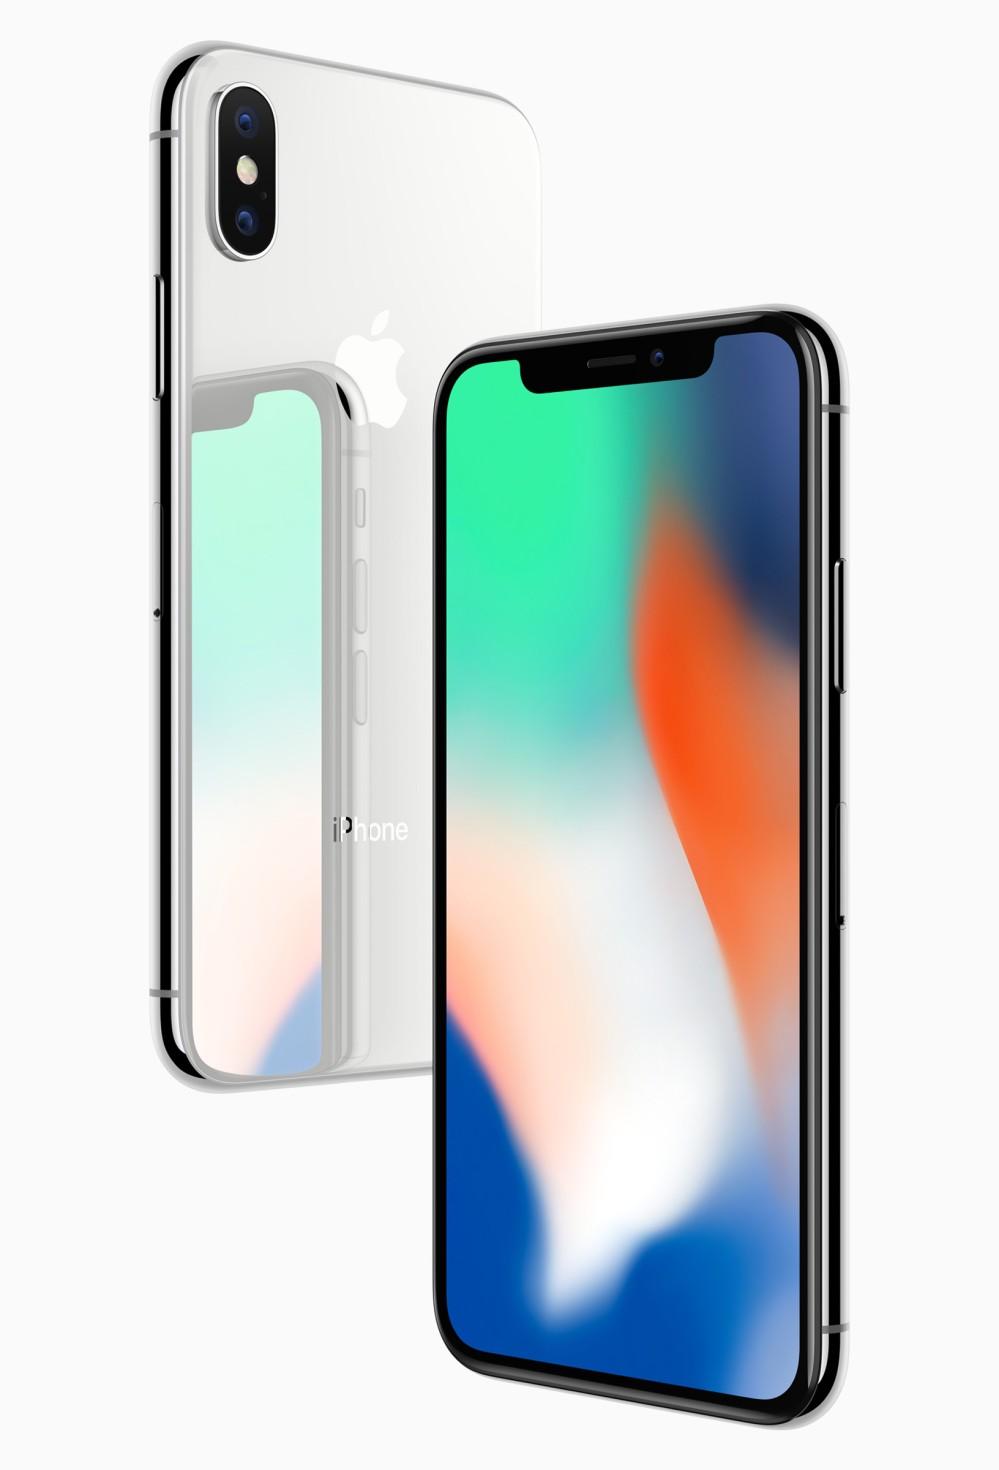 iPhone X: Αυτό είναι το premium μοντέλο της Apple με bezel-less οθόνη OLED